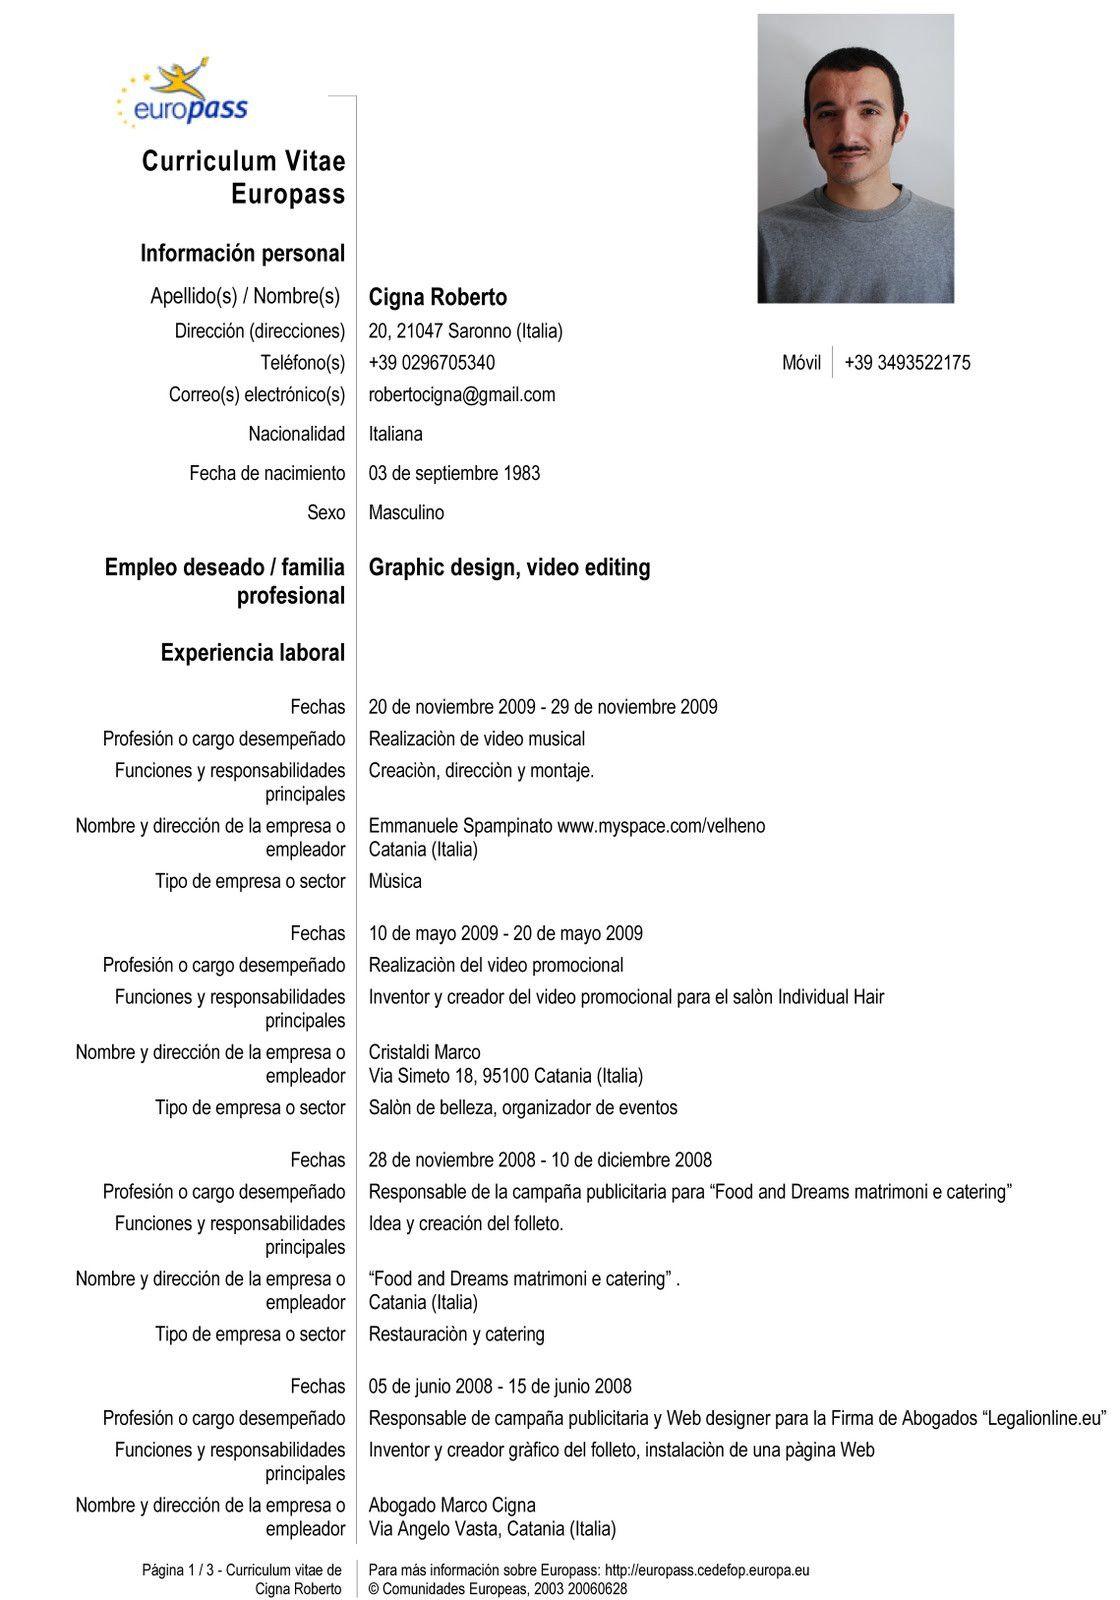 Curriculum Vitae Ejemplos Espanol En 2020 Modelos De Curriculum